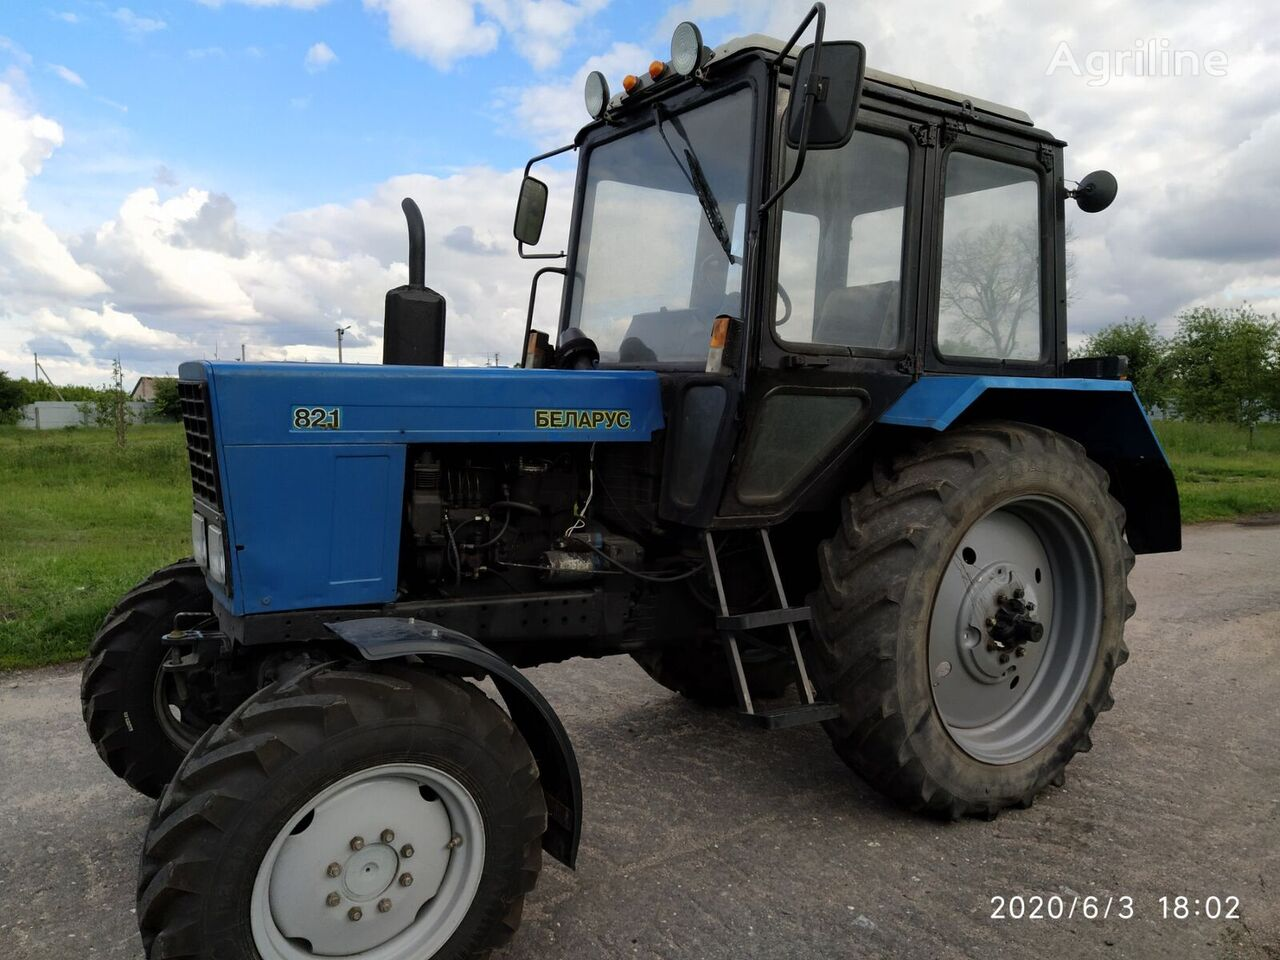 MTZ MTZ-82 wheel tractor